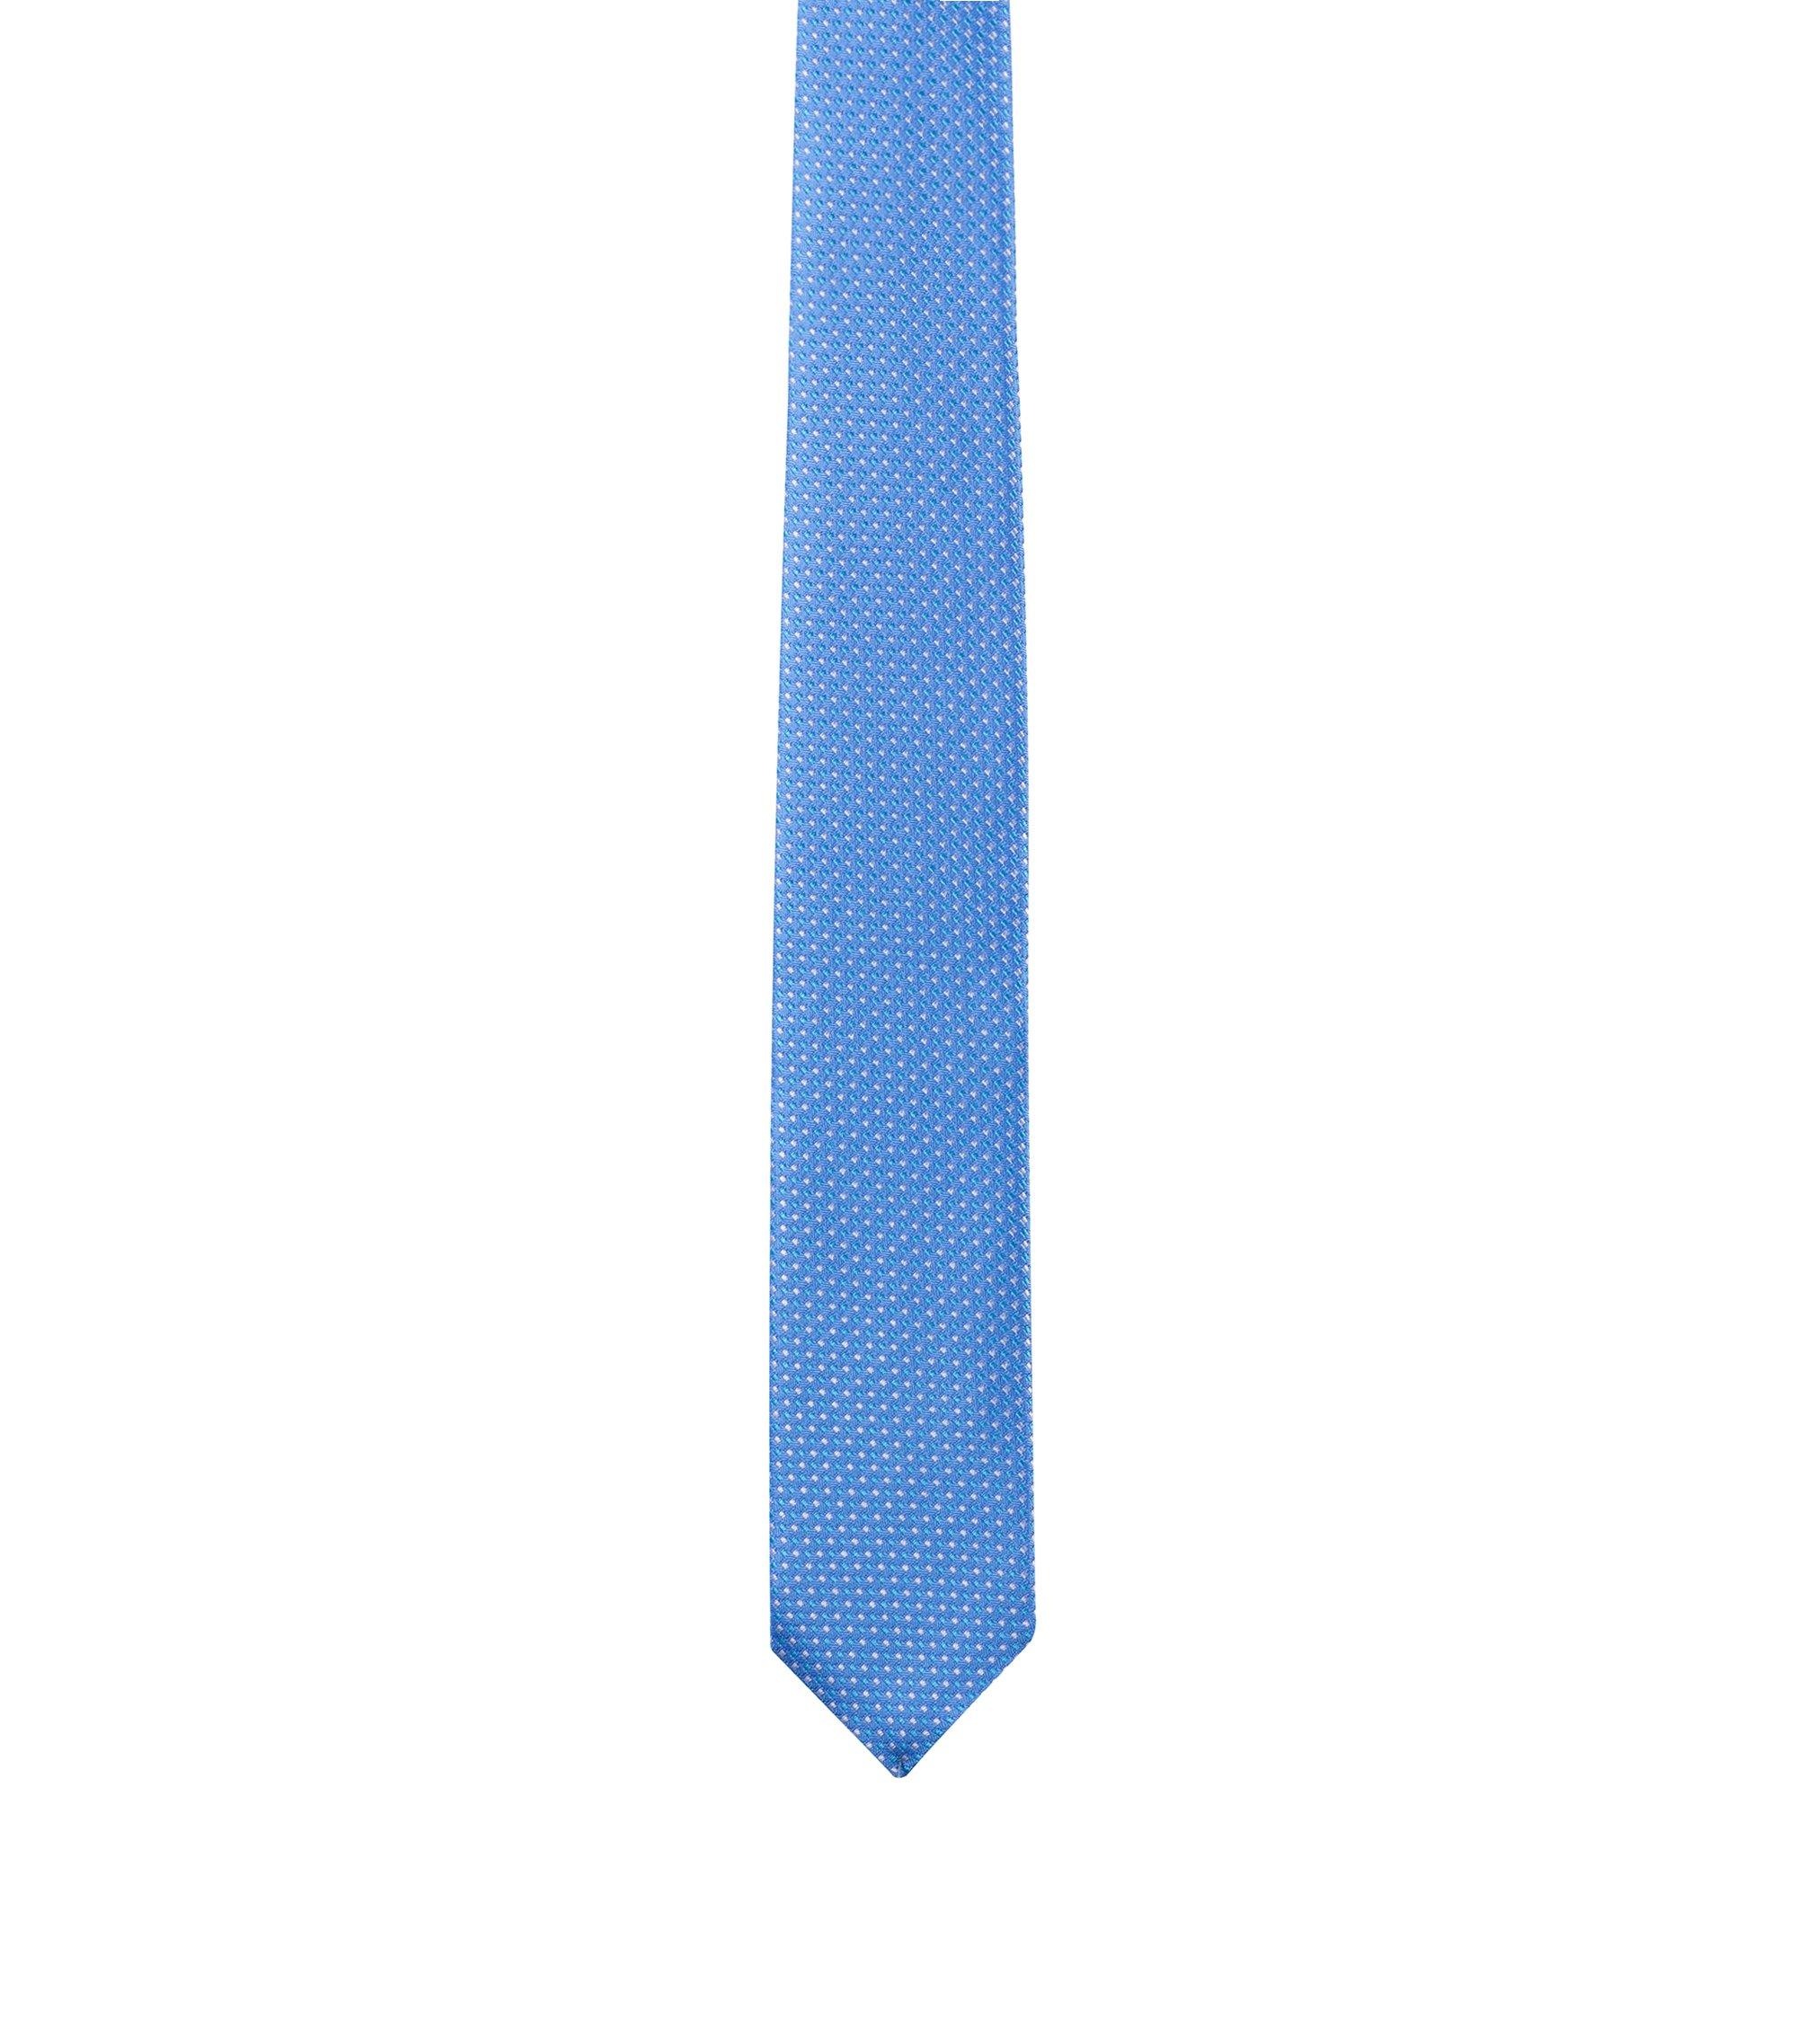 Cravatta a disegni in seta jacquard, Celeste